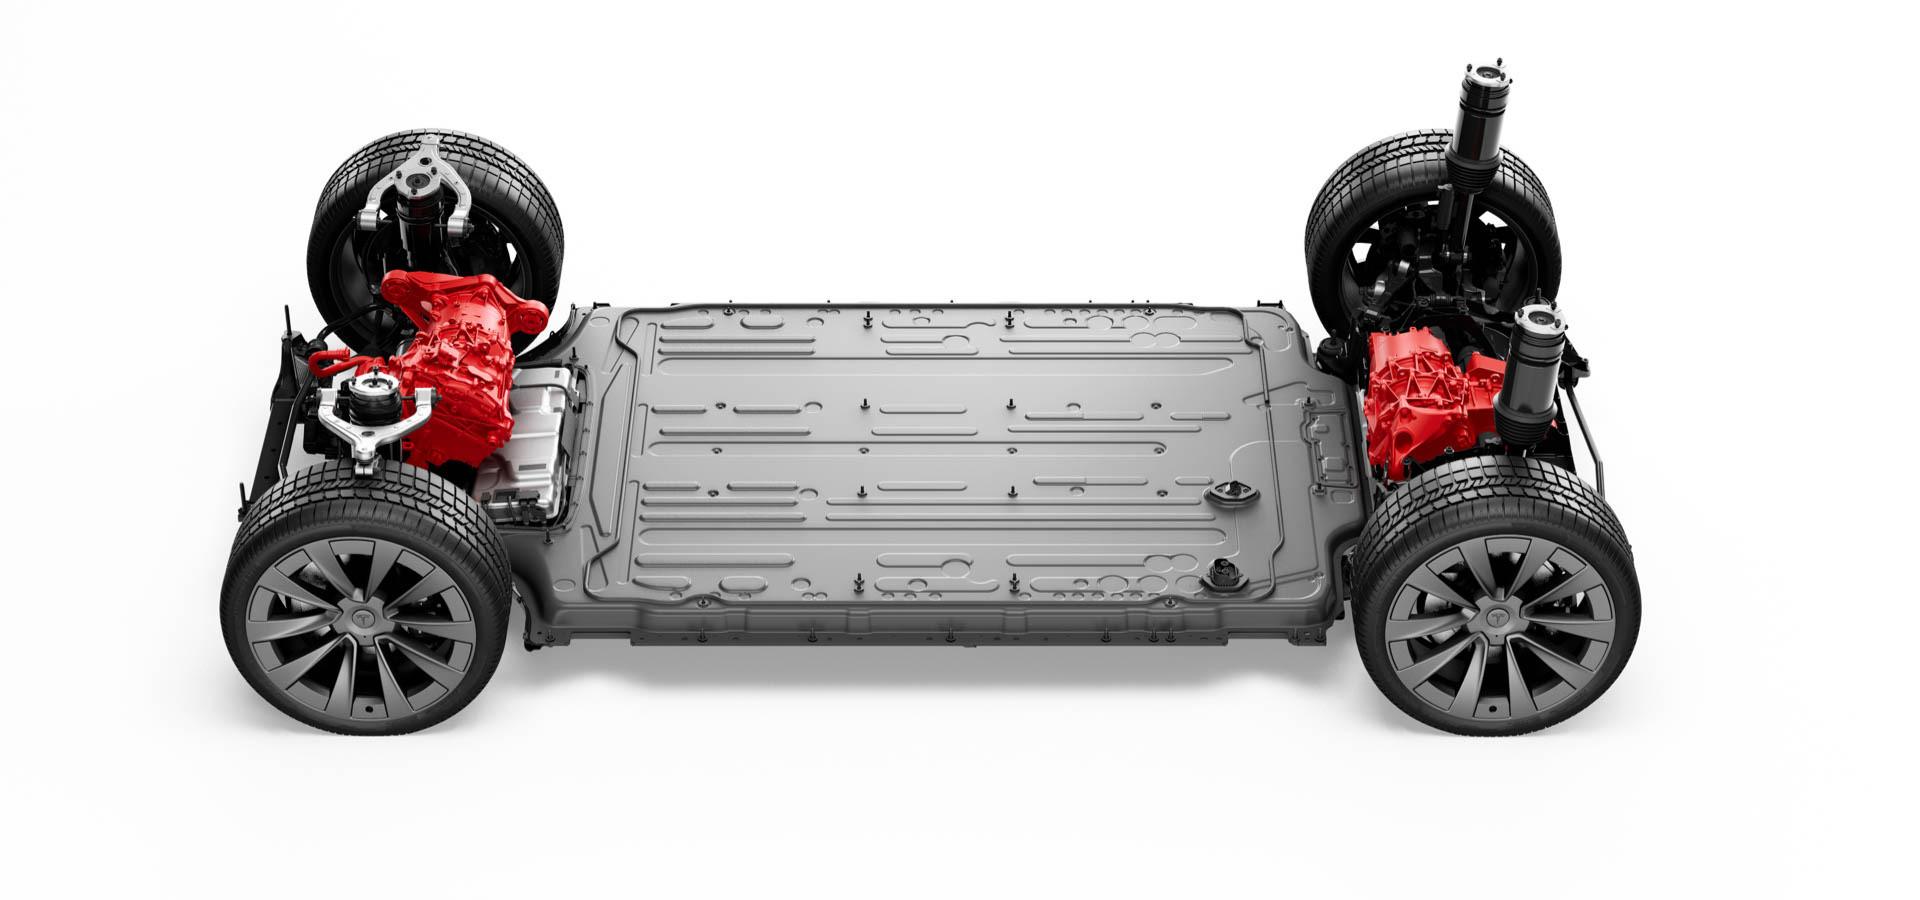 Model X Dual Motor All-Wheel Drive